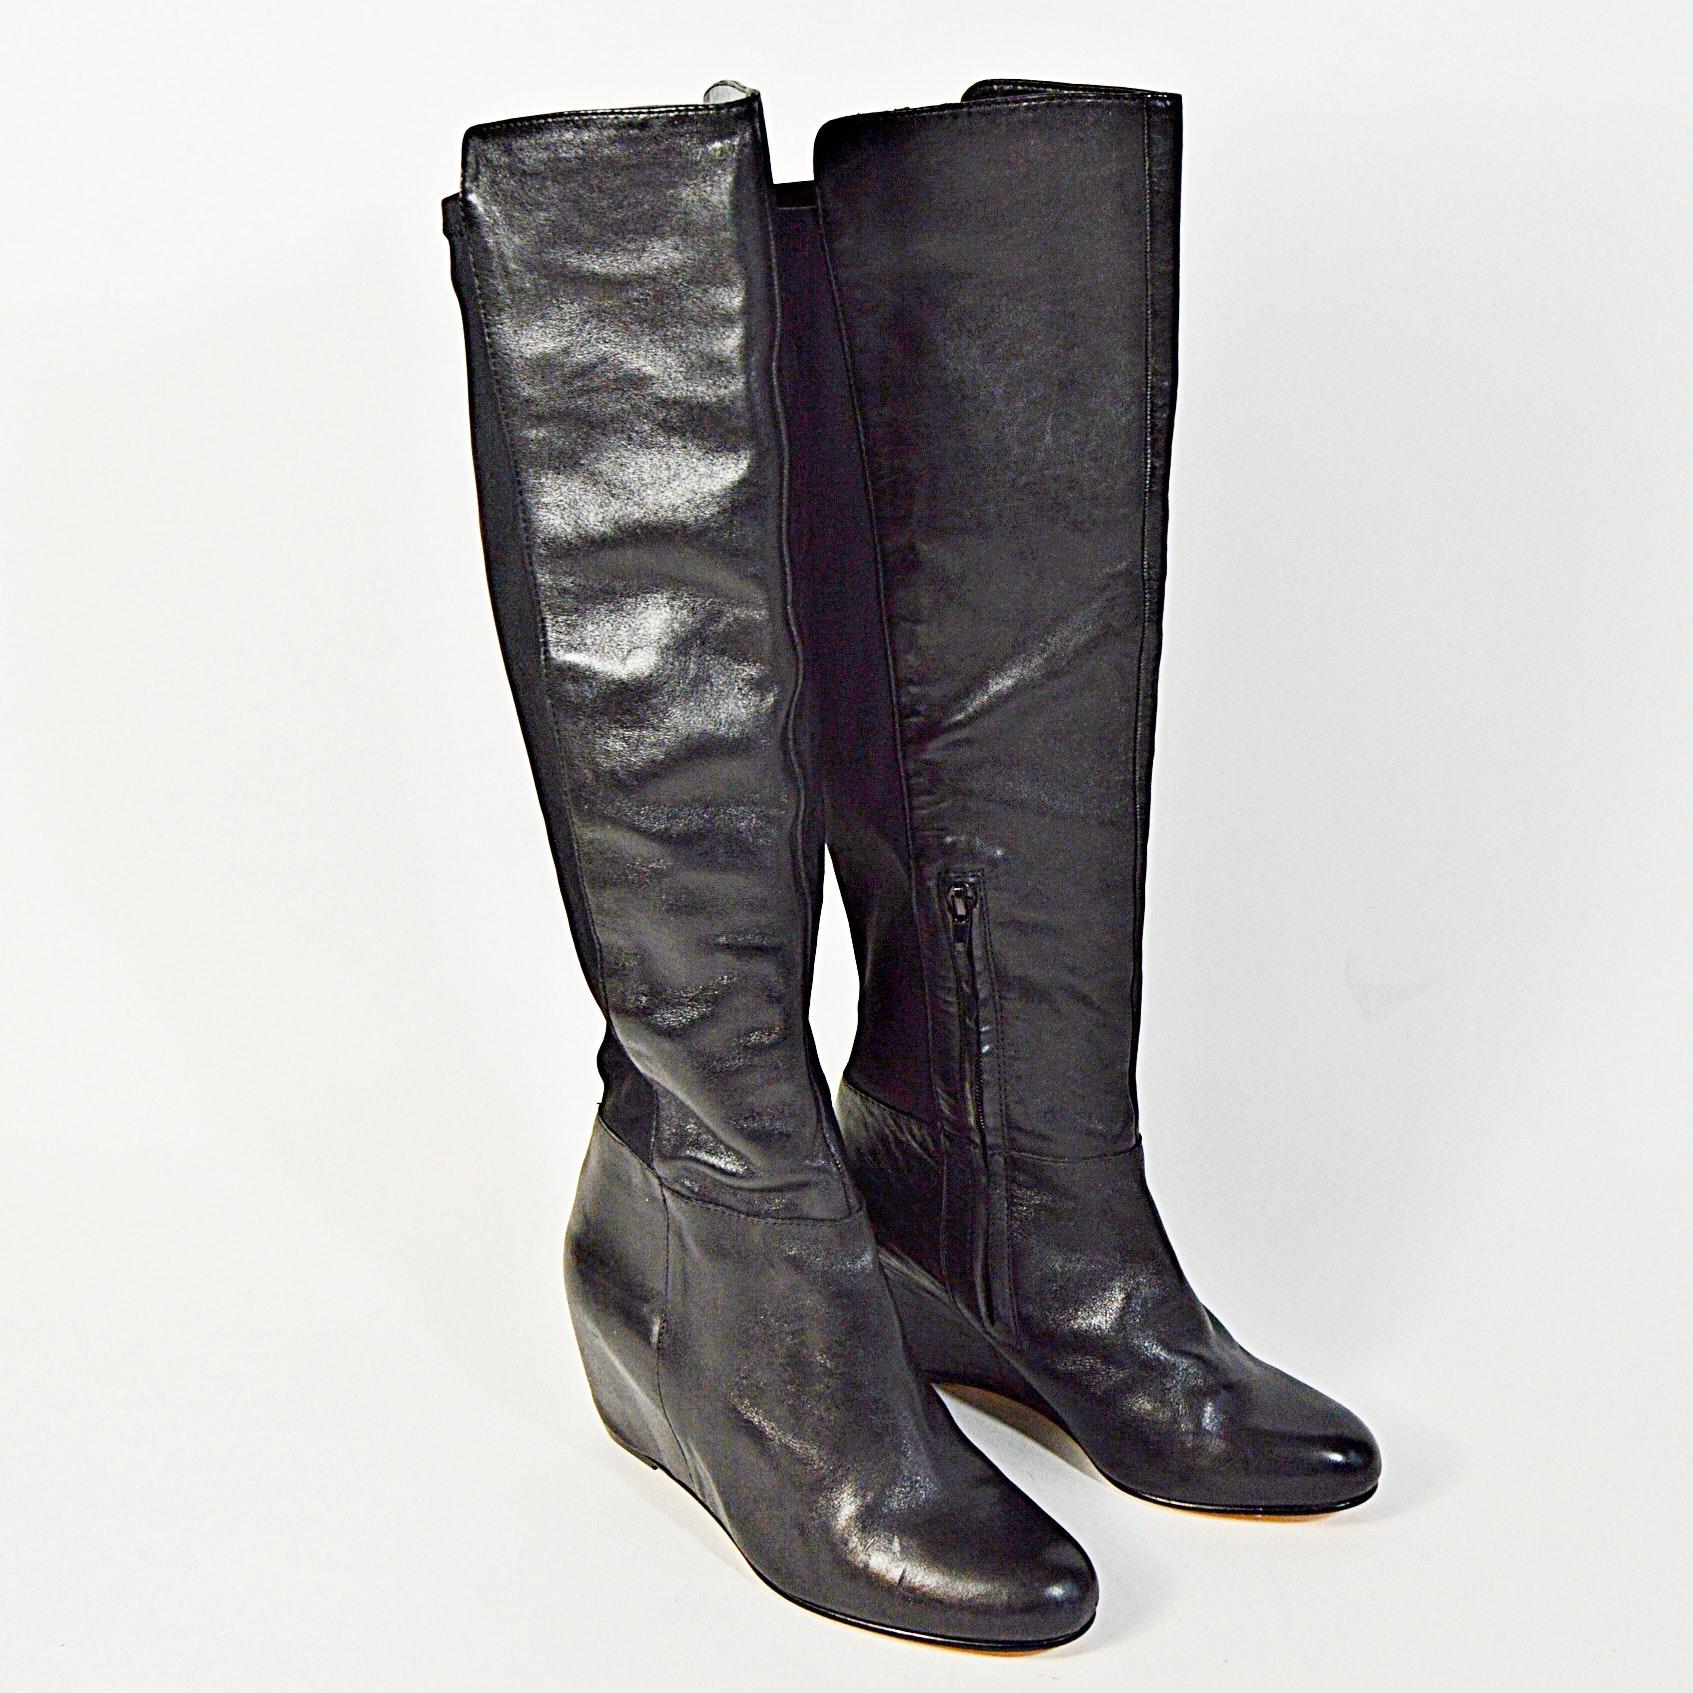 Women's Saks Fifth Avenue BLACK Boots